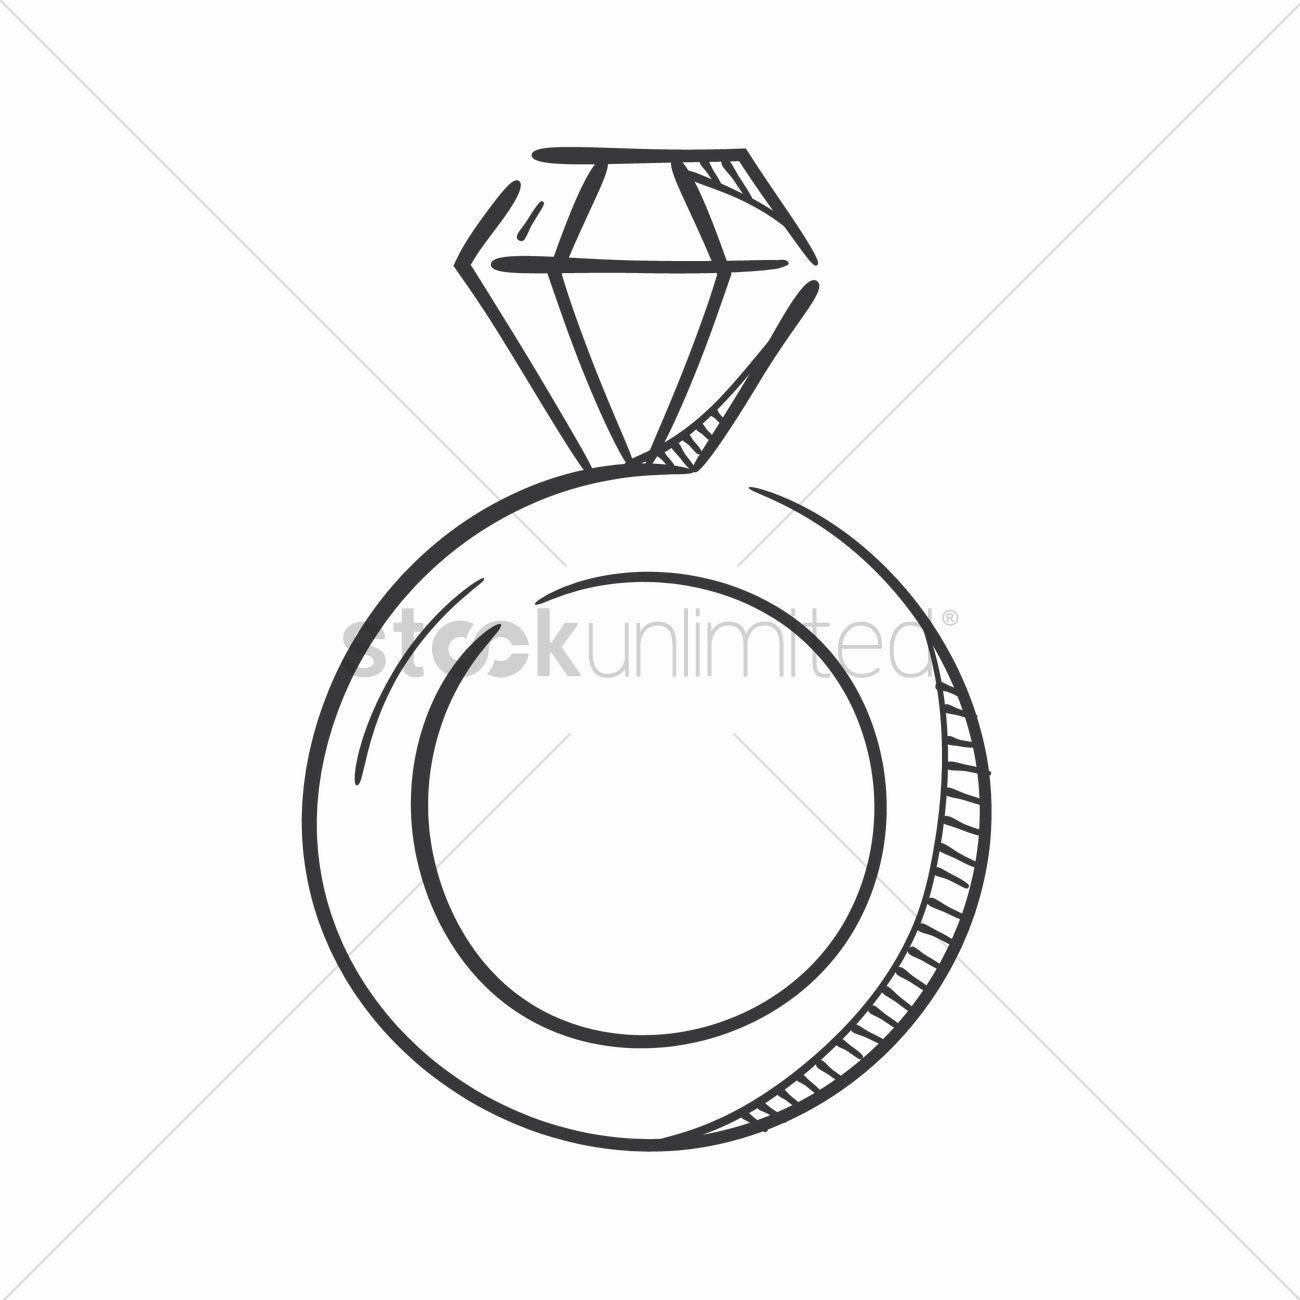 1300x1300 Diamond Ring Vector Free Download New Diamond Ring Vector Image